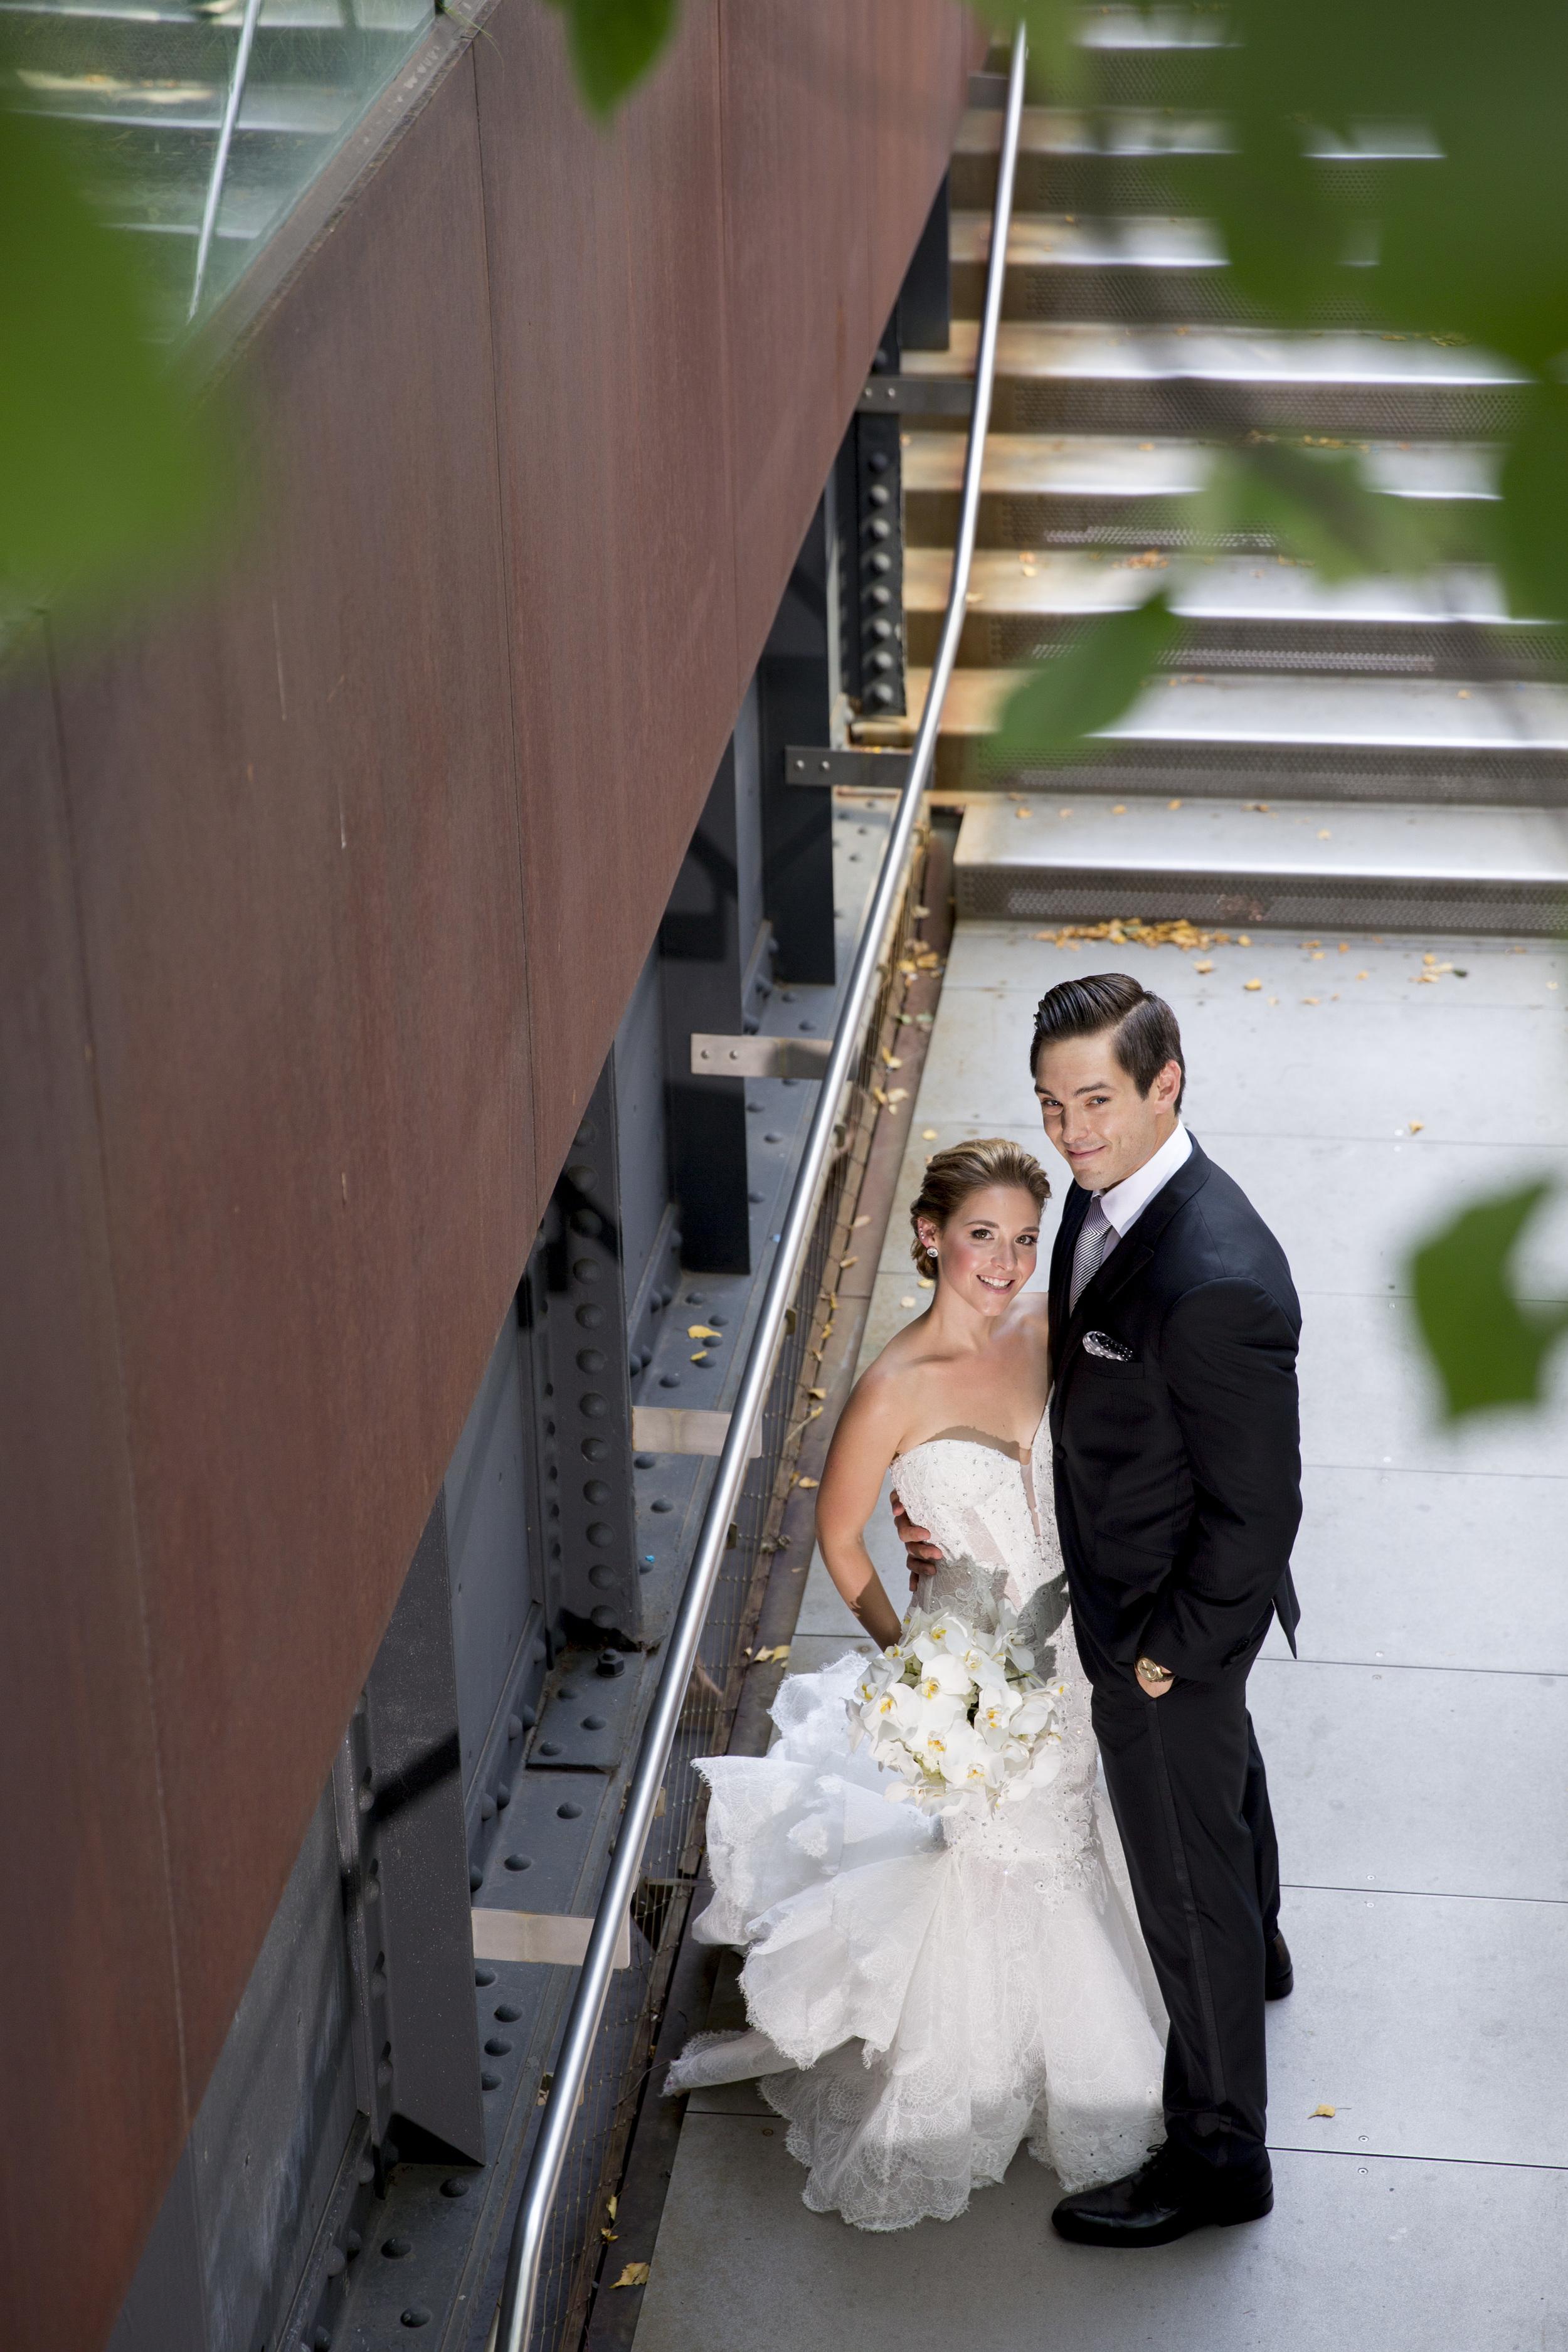 Ceci_New_York_Style_Luxury_Custom_Summer_Wedding_CeciBride_Letterpress_NewYork_Foil_Lighthouse_Chelsea_Piers_25.jpg